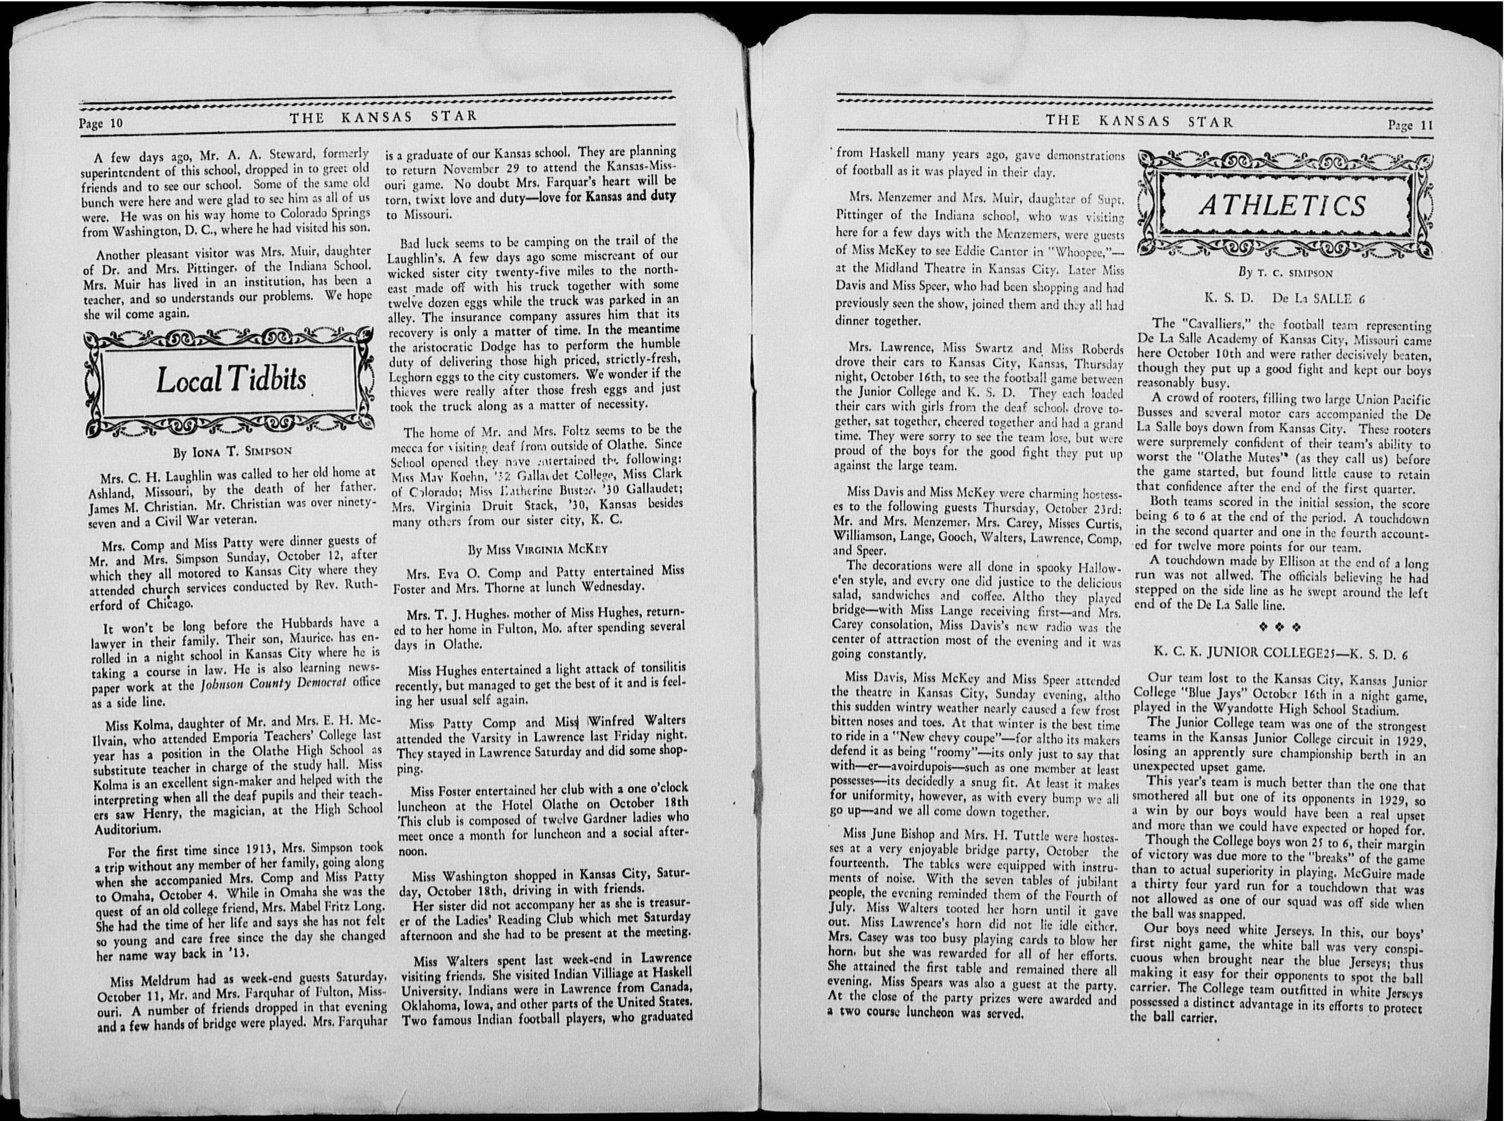 The Kansas Star, volume 44, number 2 - 10-11